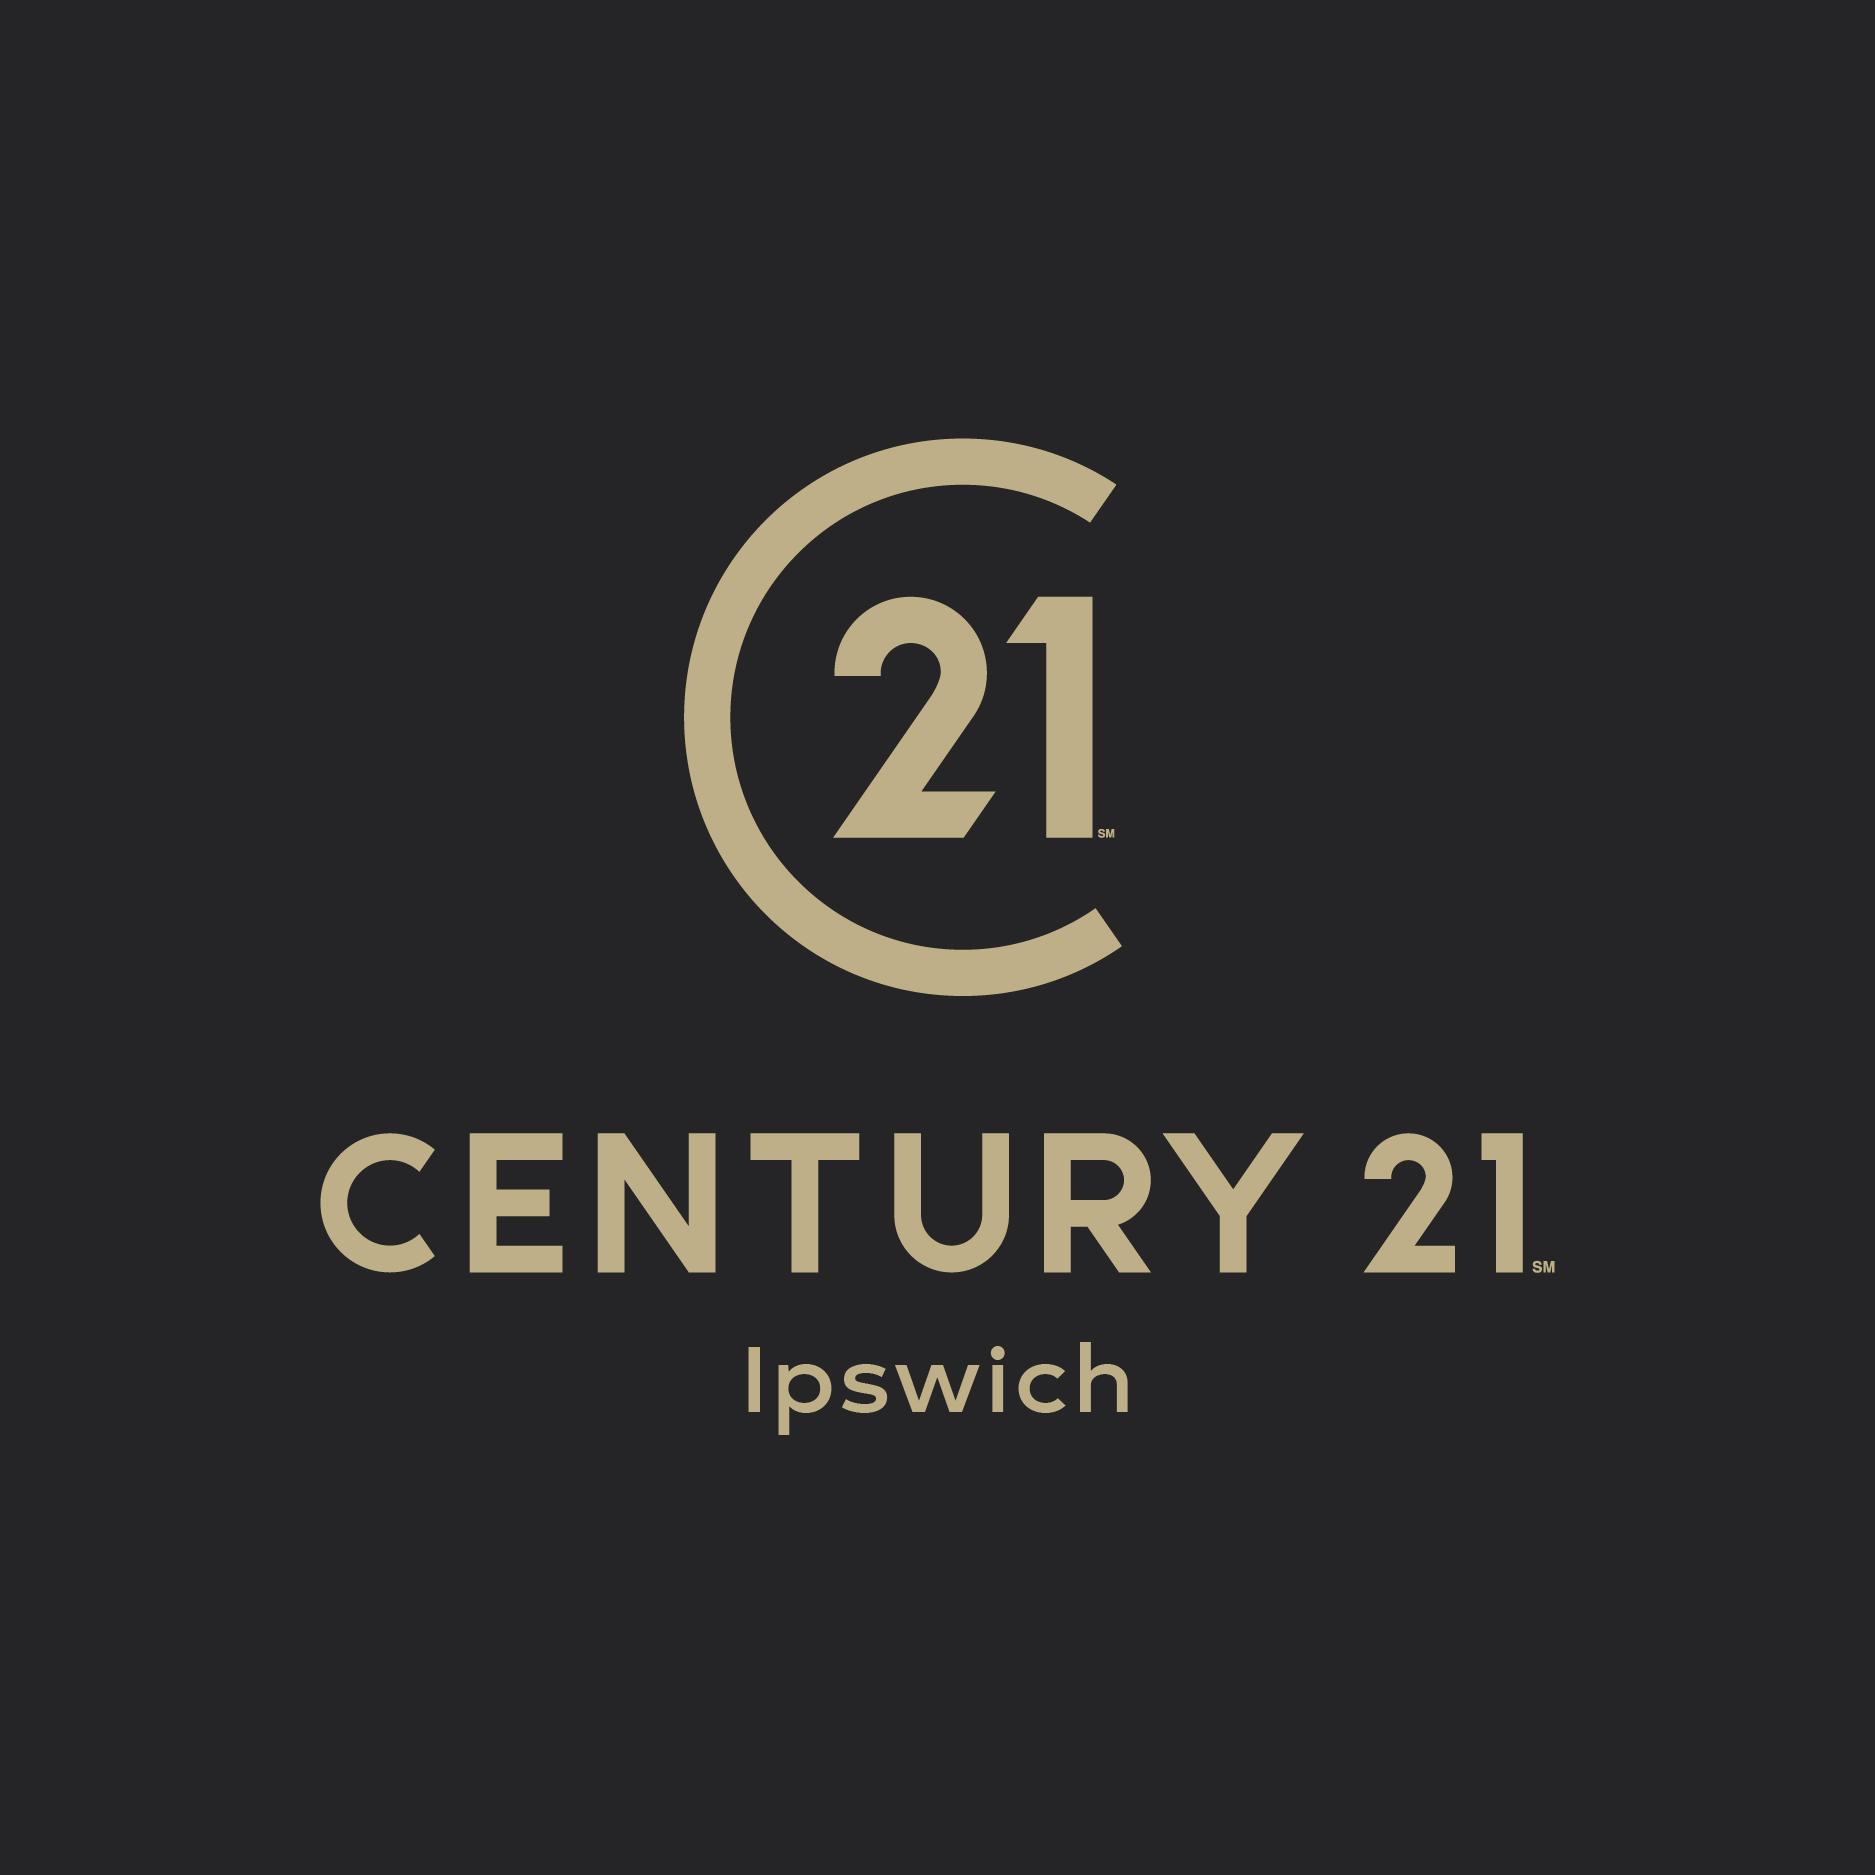 Century 21 - Ipswich